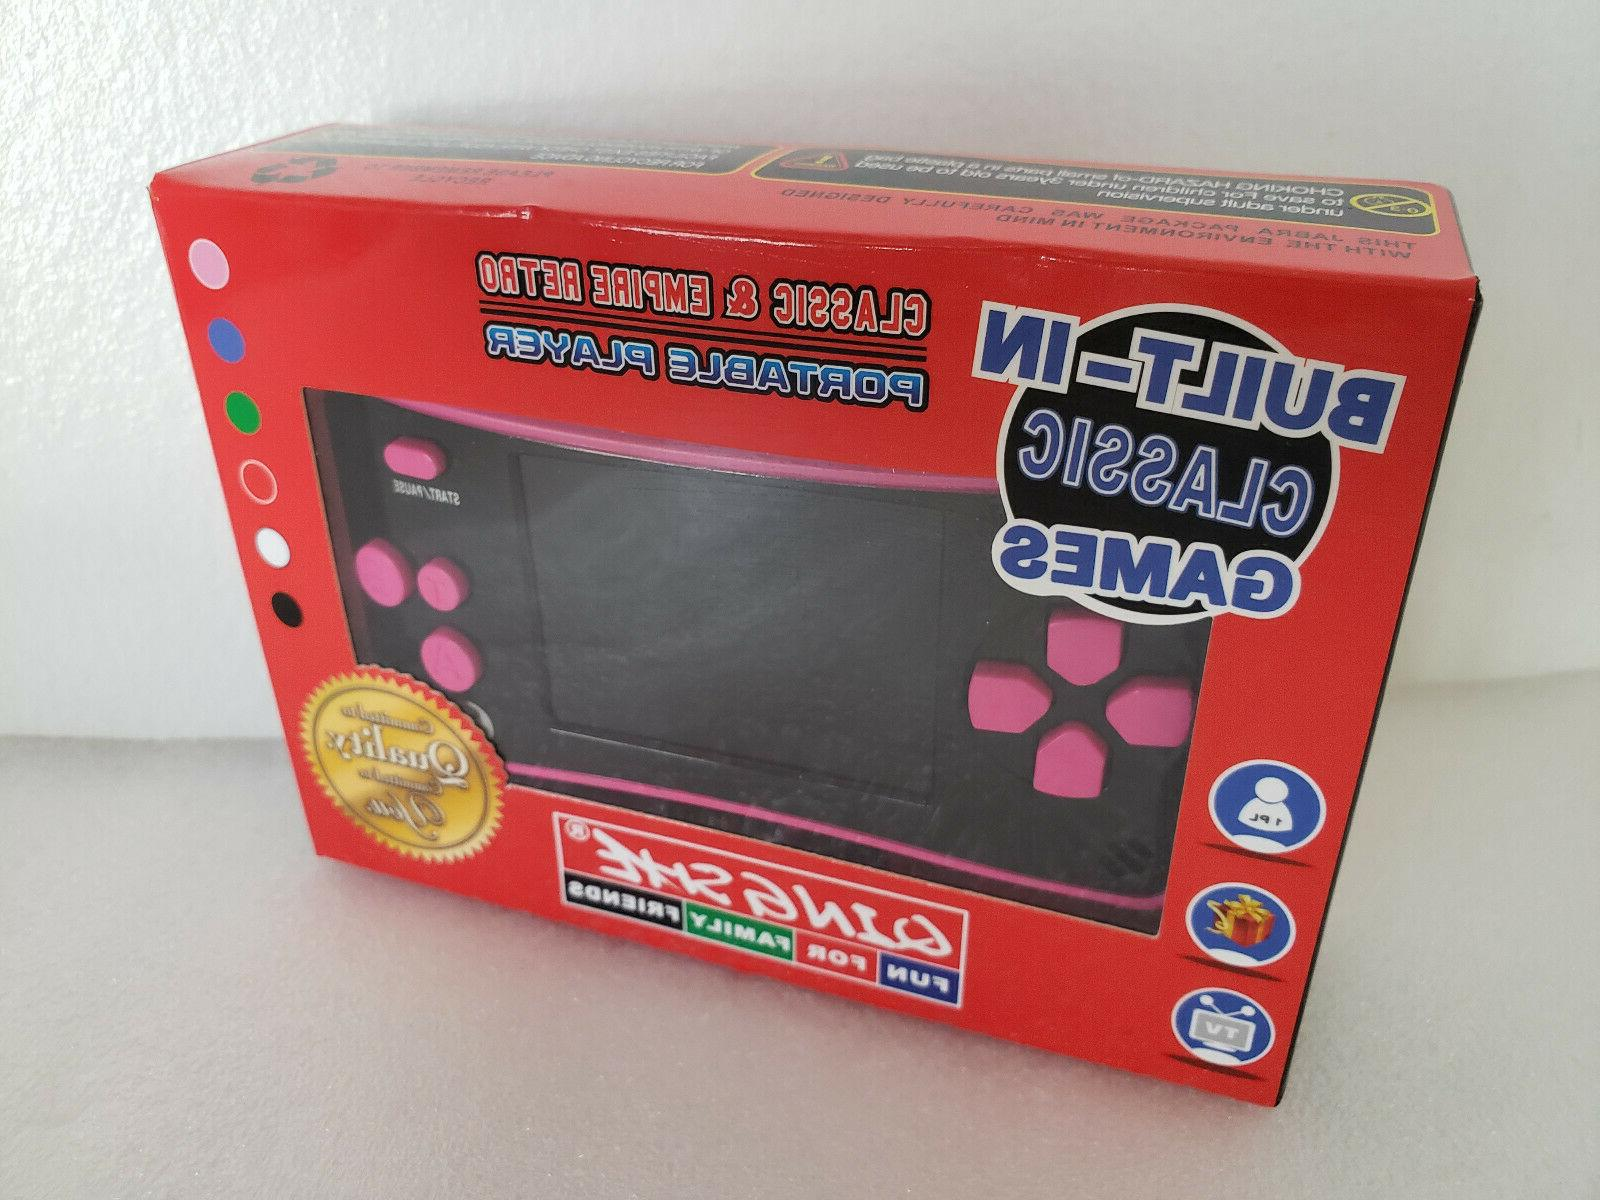 QingShe Portable Games for Kids Built in 182 Games